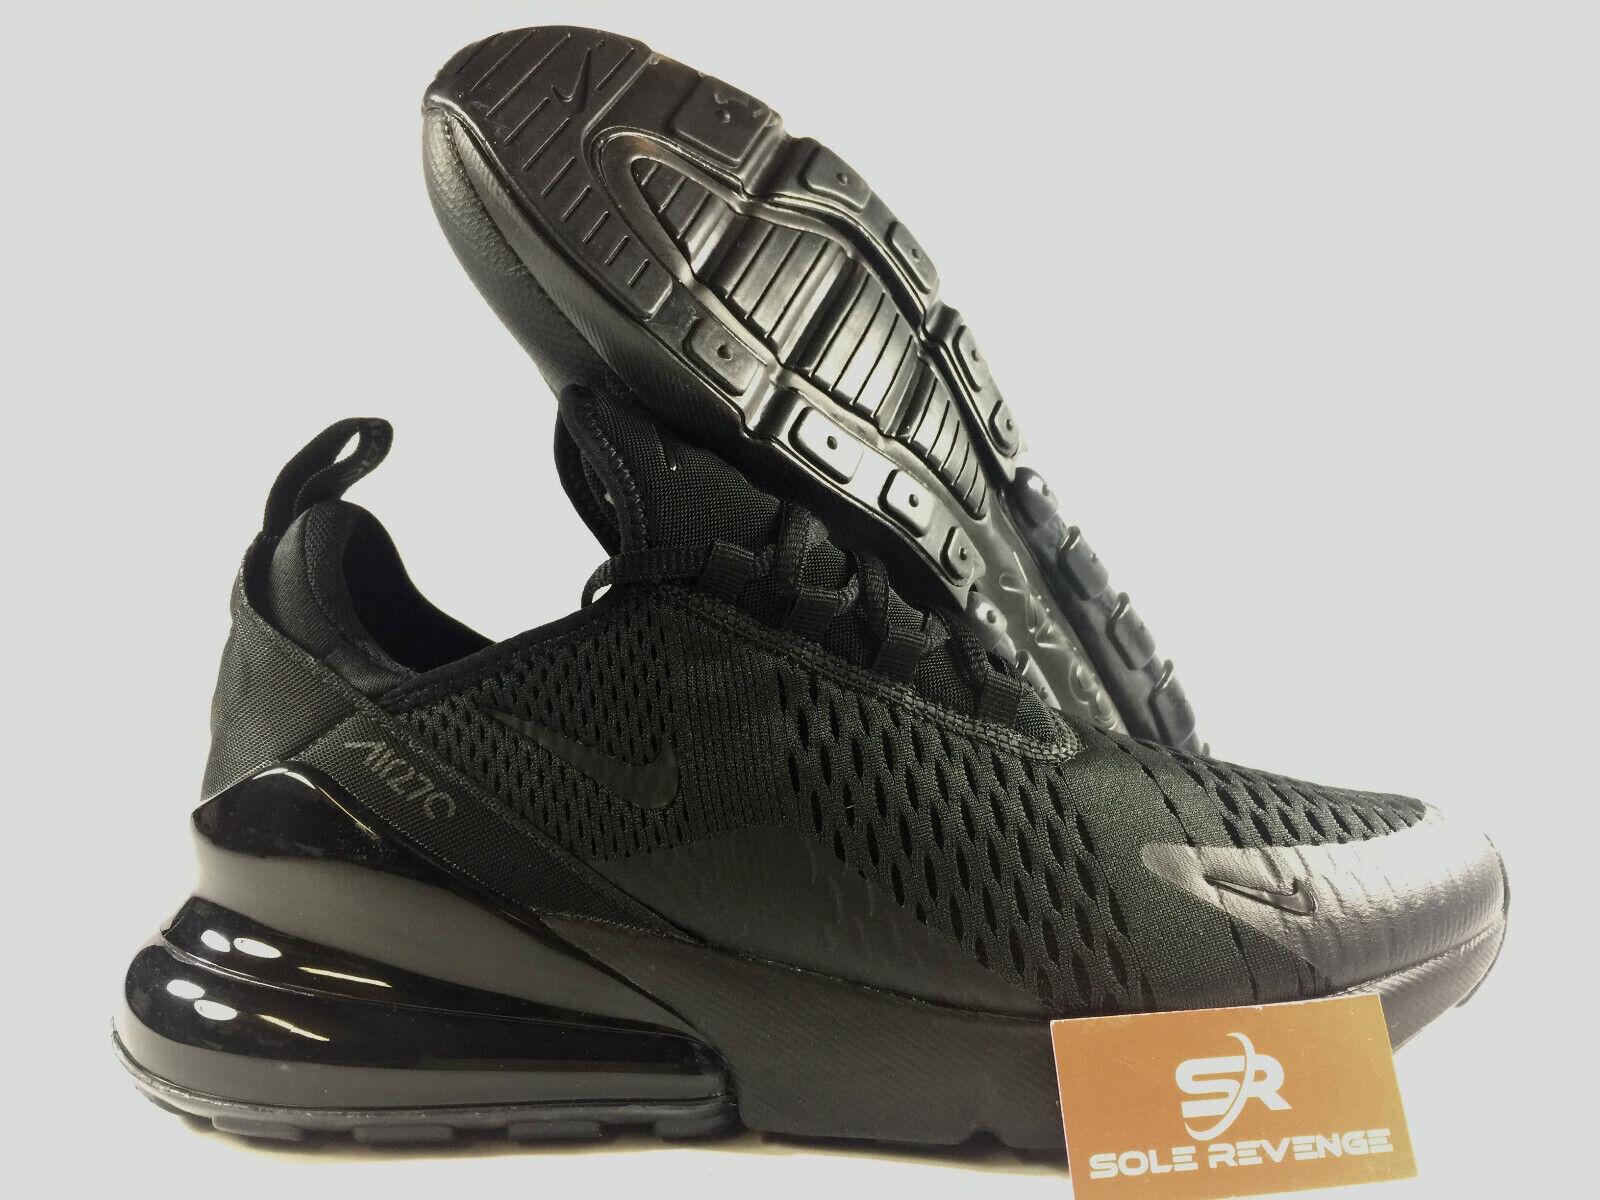 NOUVEAU NIKE AIR MAX 270  Triple Noir  AH8050-005 Chaussures Hommes c1